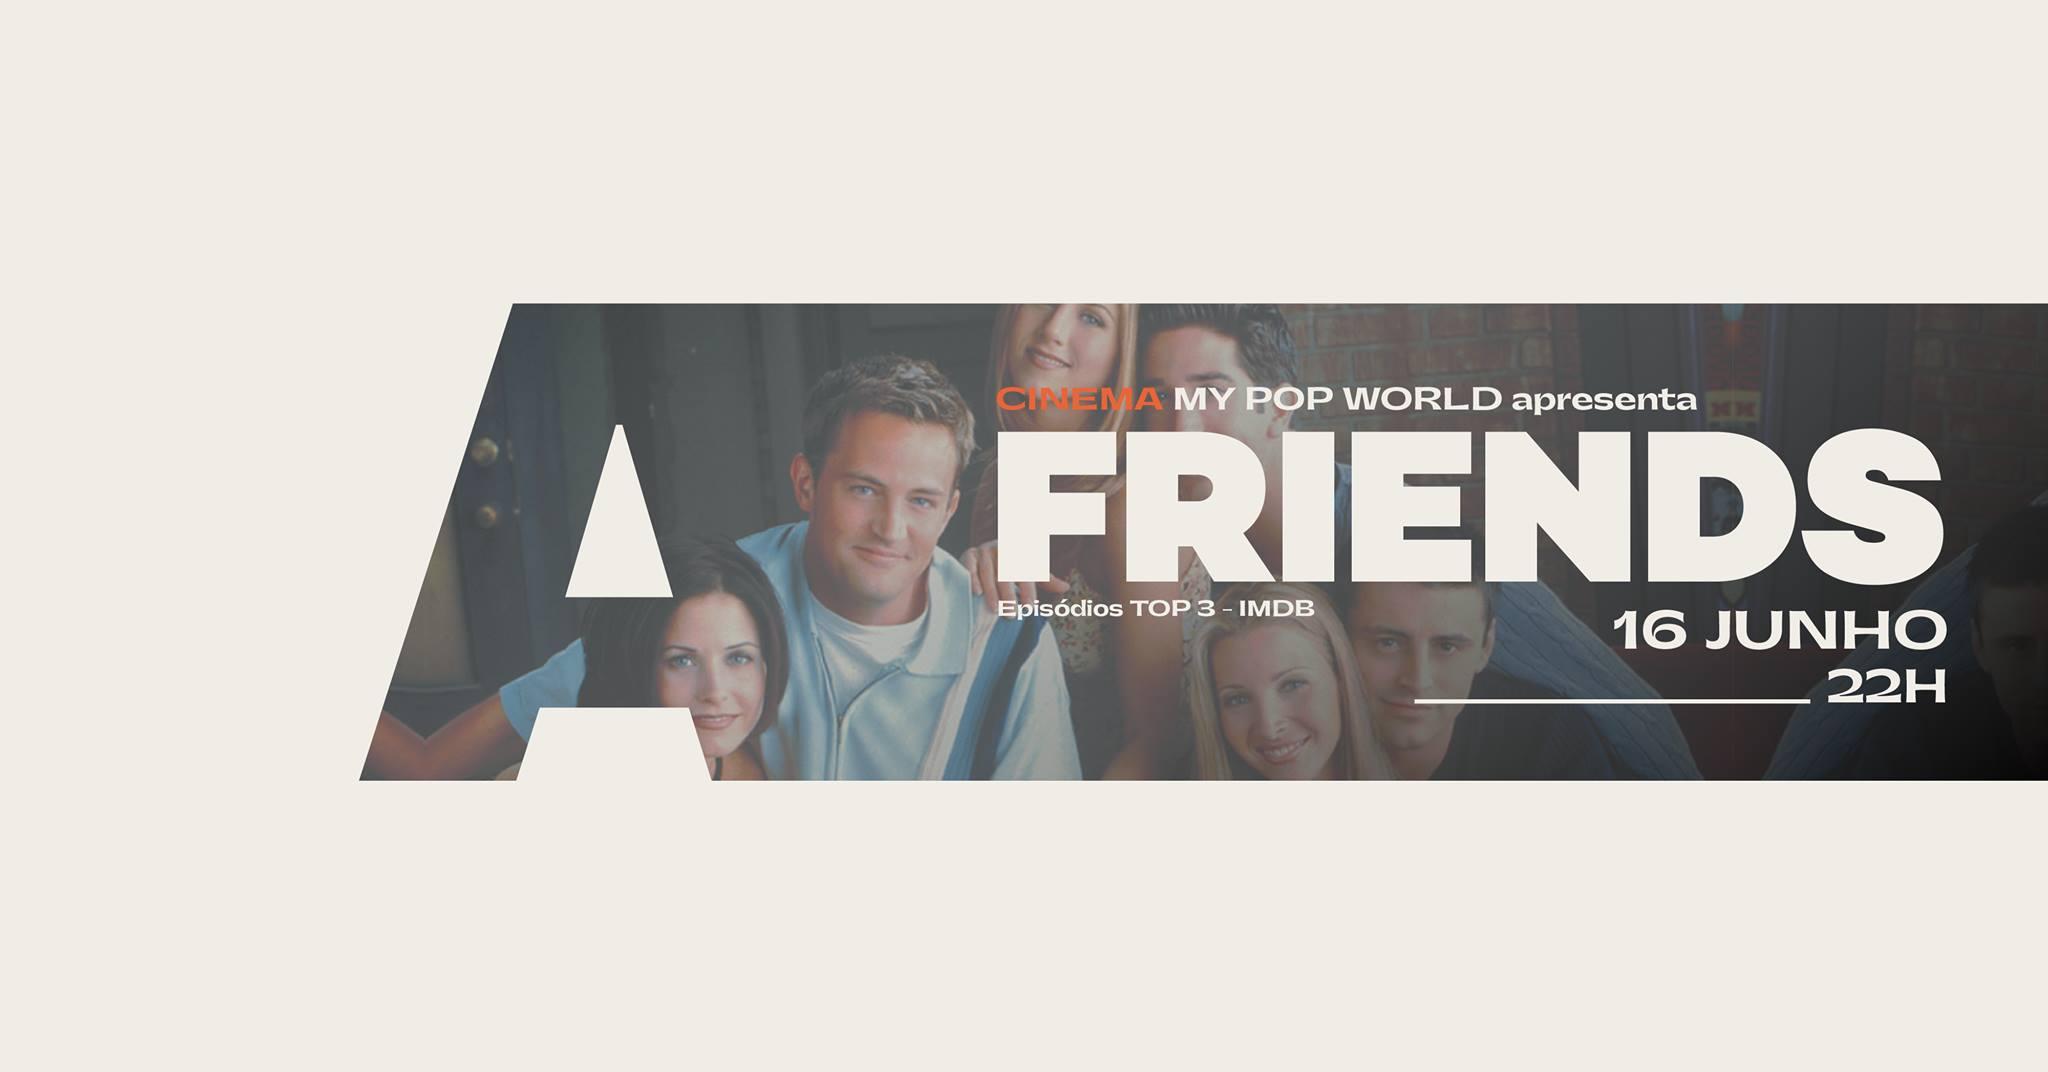 My Pop World apresenta Friends @Avenida Café-Concerto